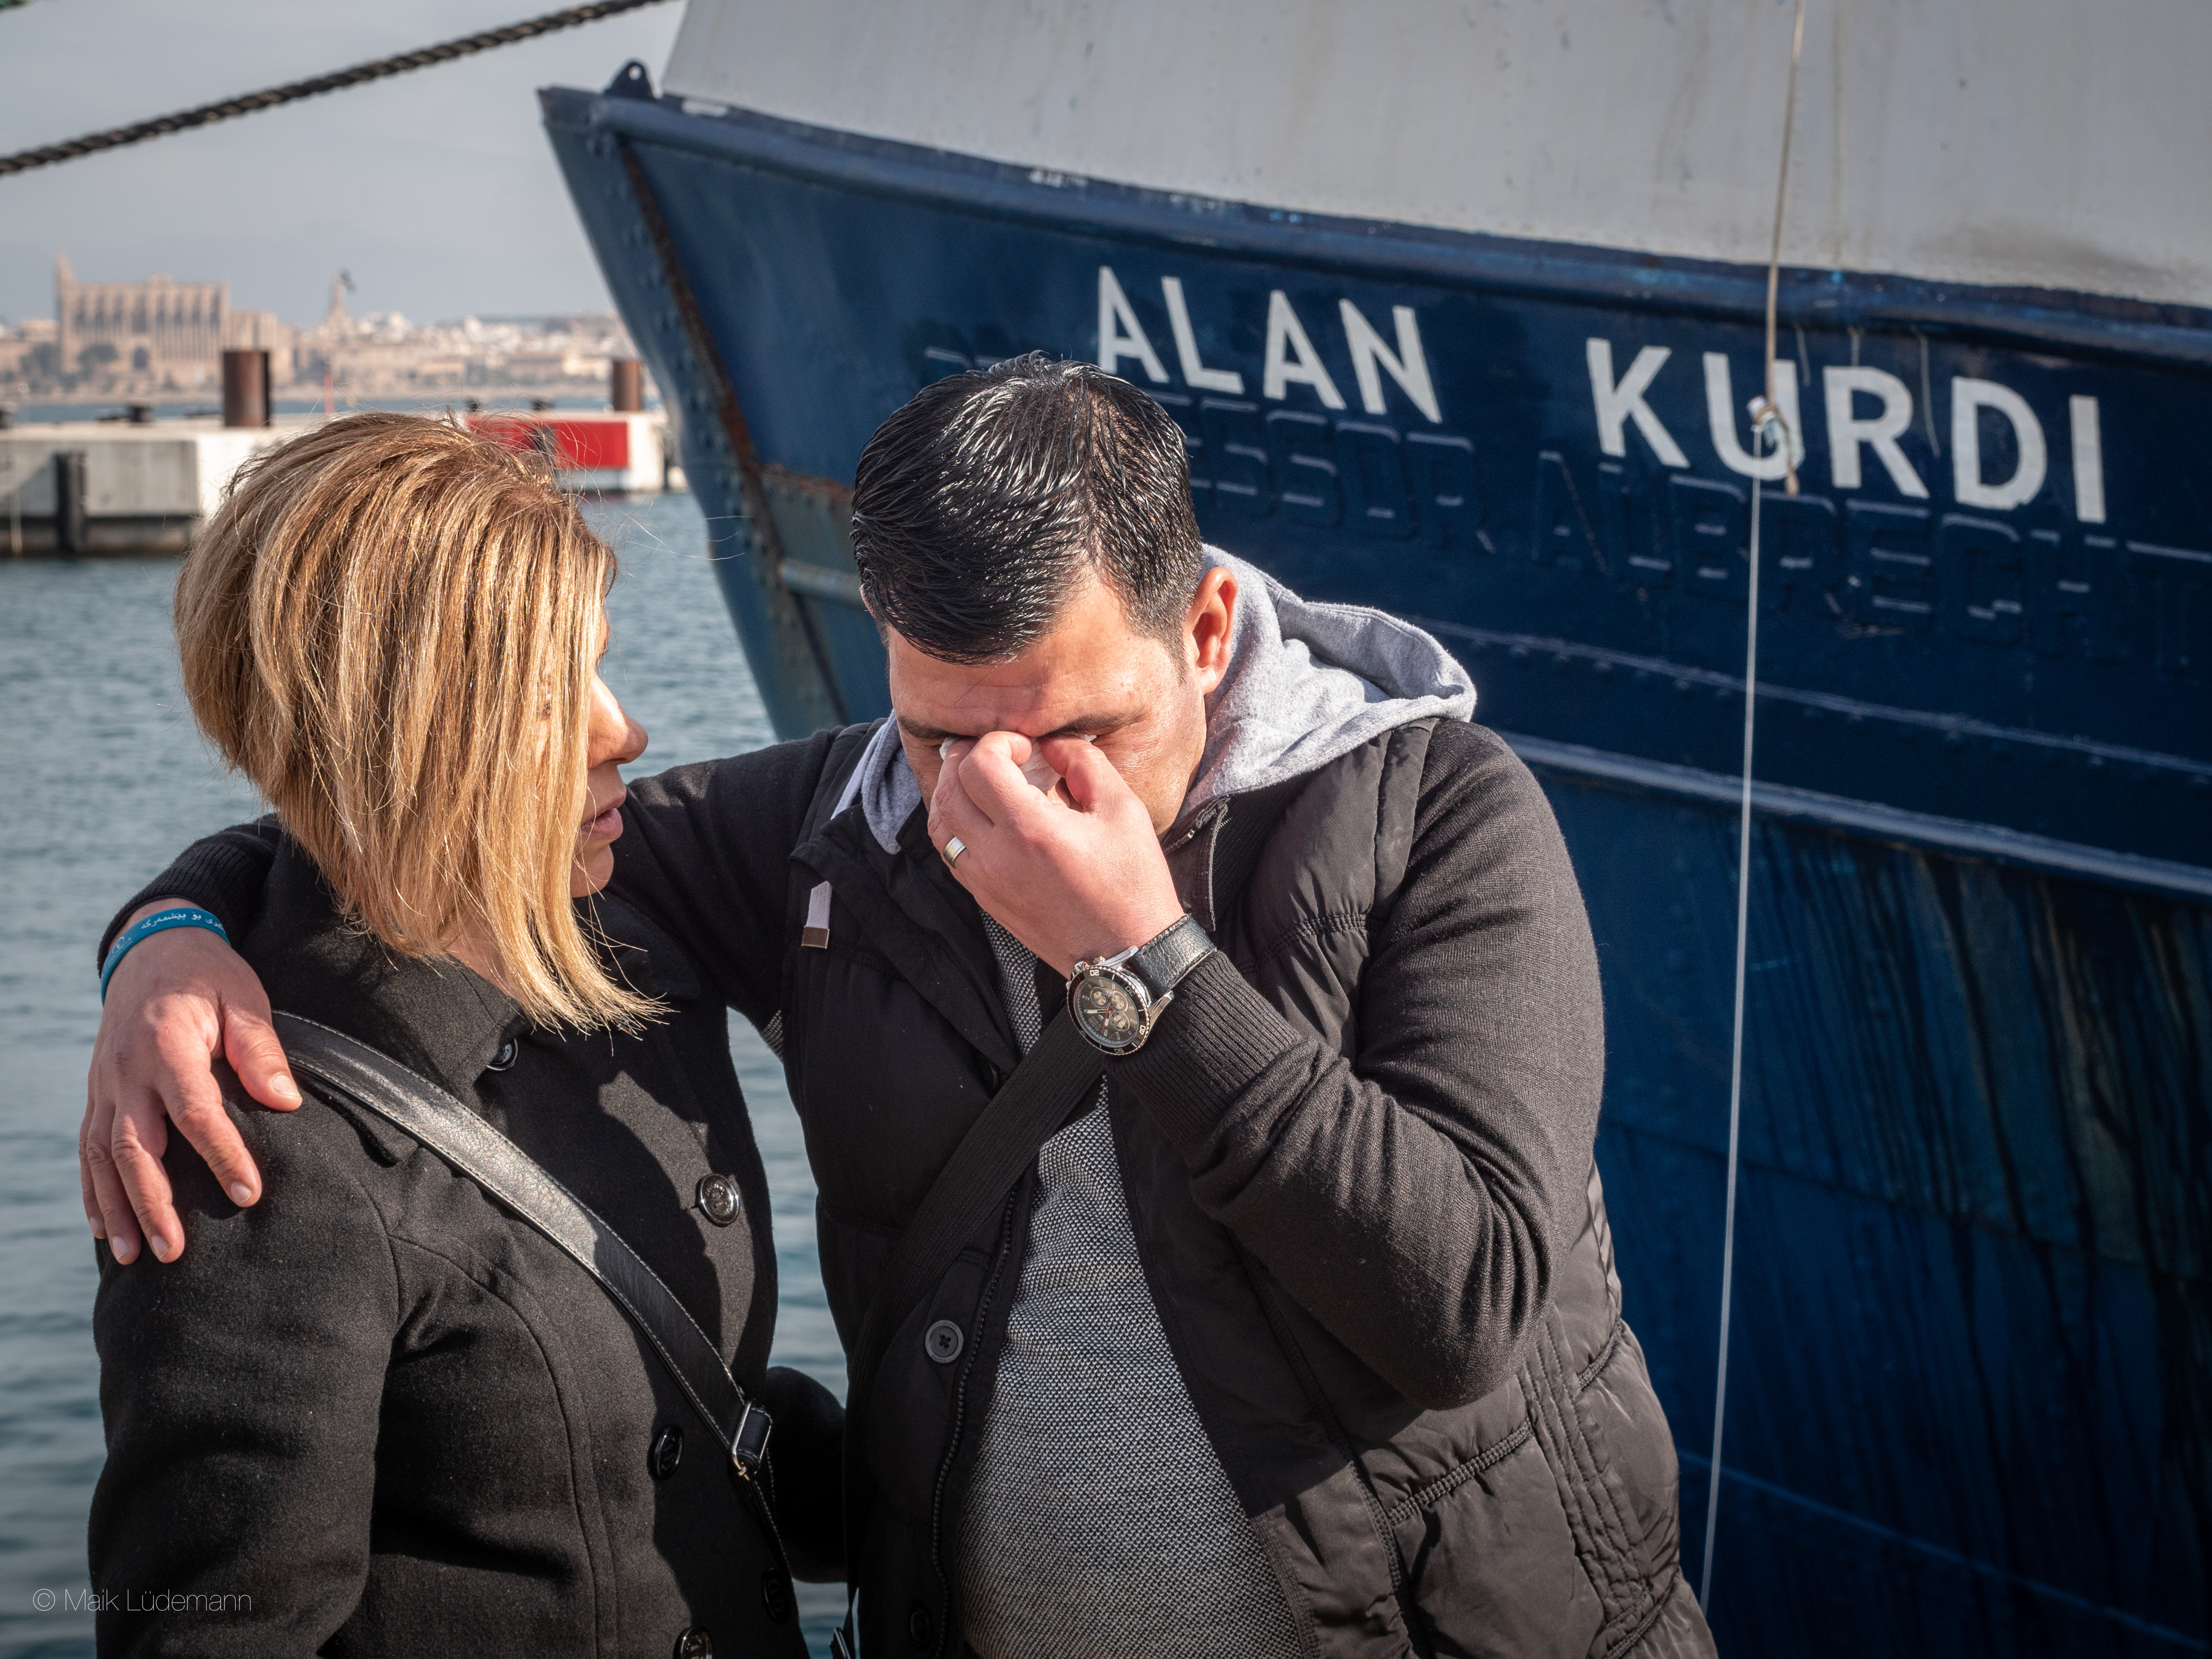 Schiffstaufe: ALAN KURDI